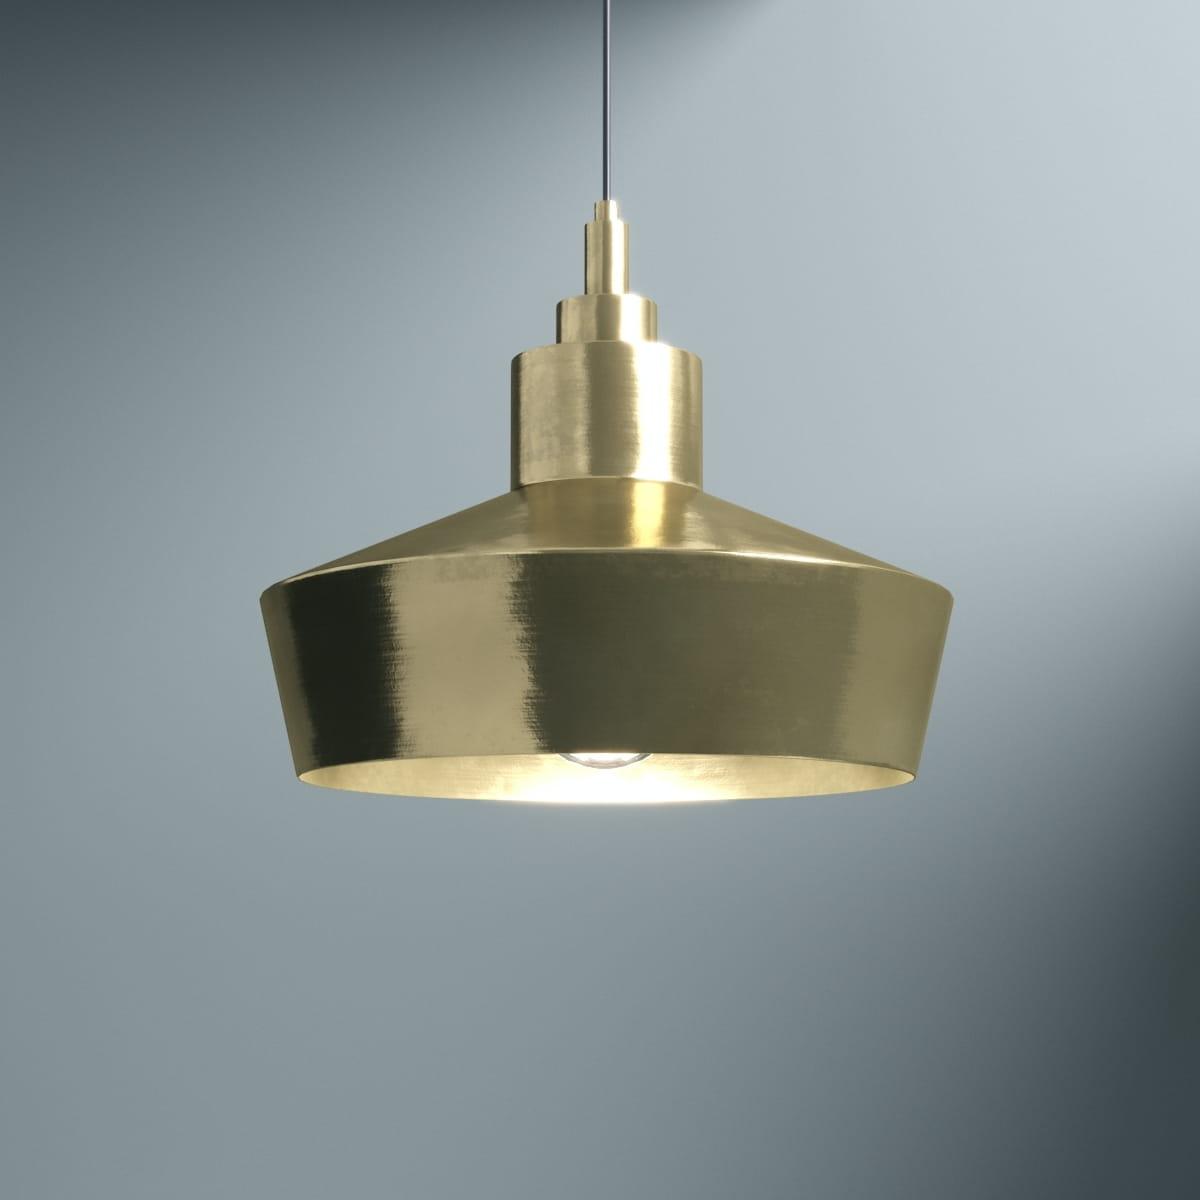 lamp 26 AM247